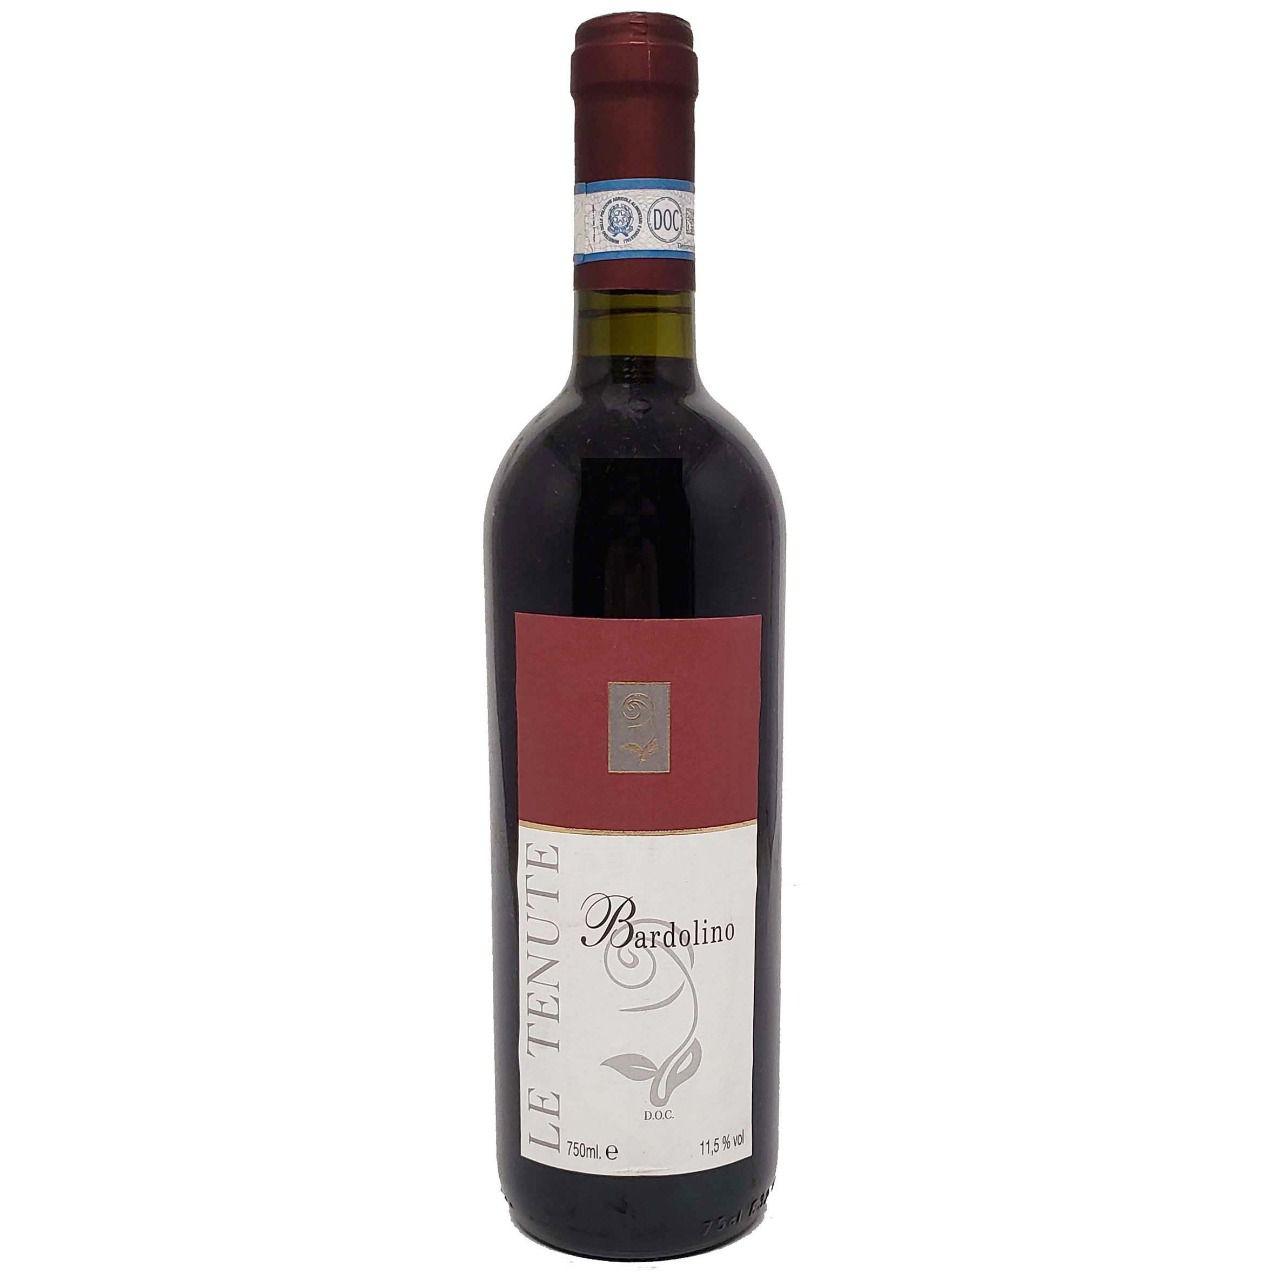 Vinho Tinto Tenute Bardolino D.O.C - 750ml -